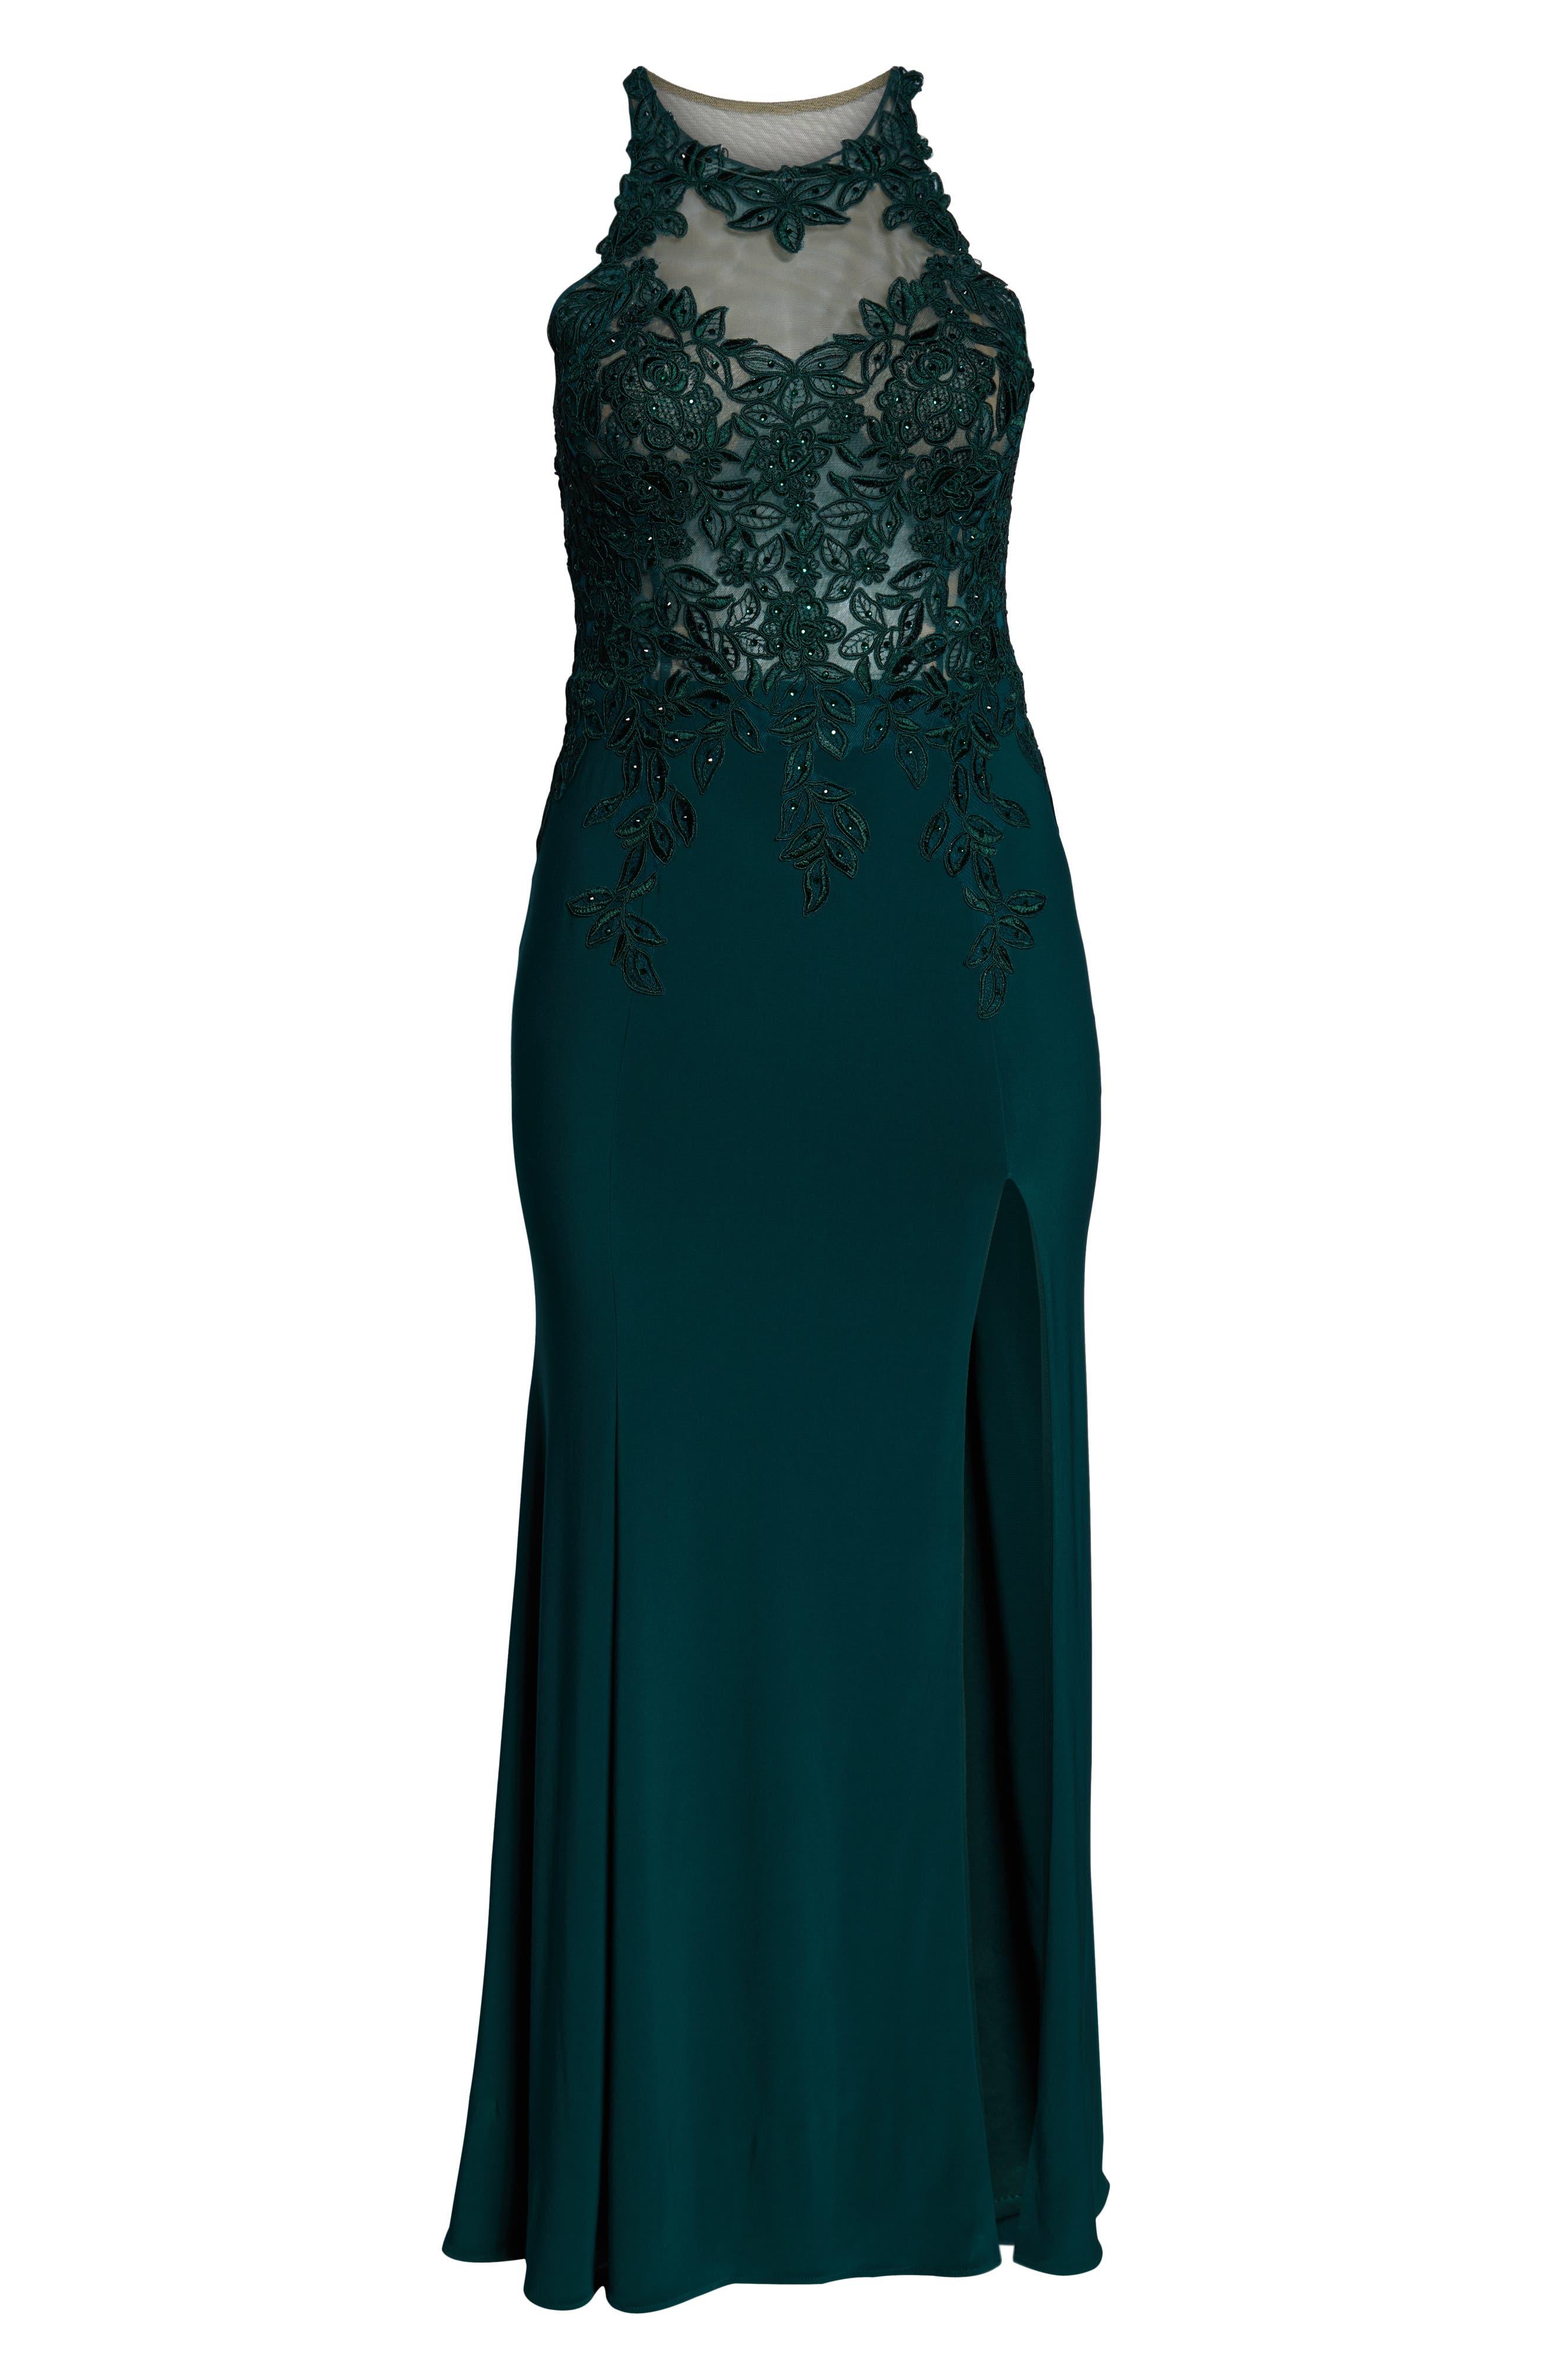 XSCAPE, Embroidered Slit Dress, Alternate thumbnail 7, color, HUNTER